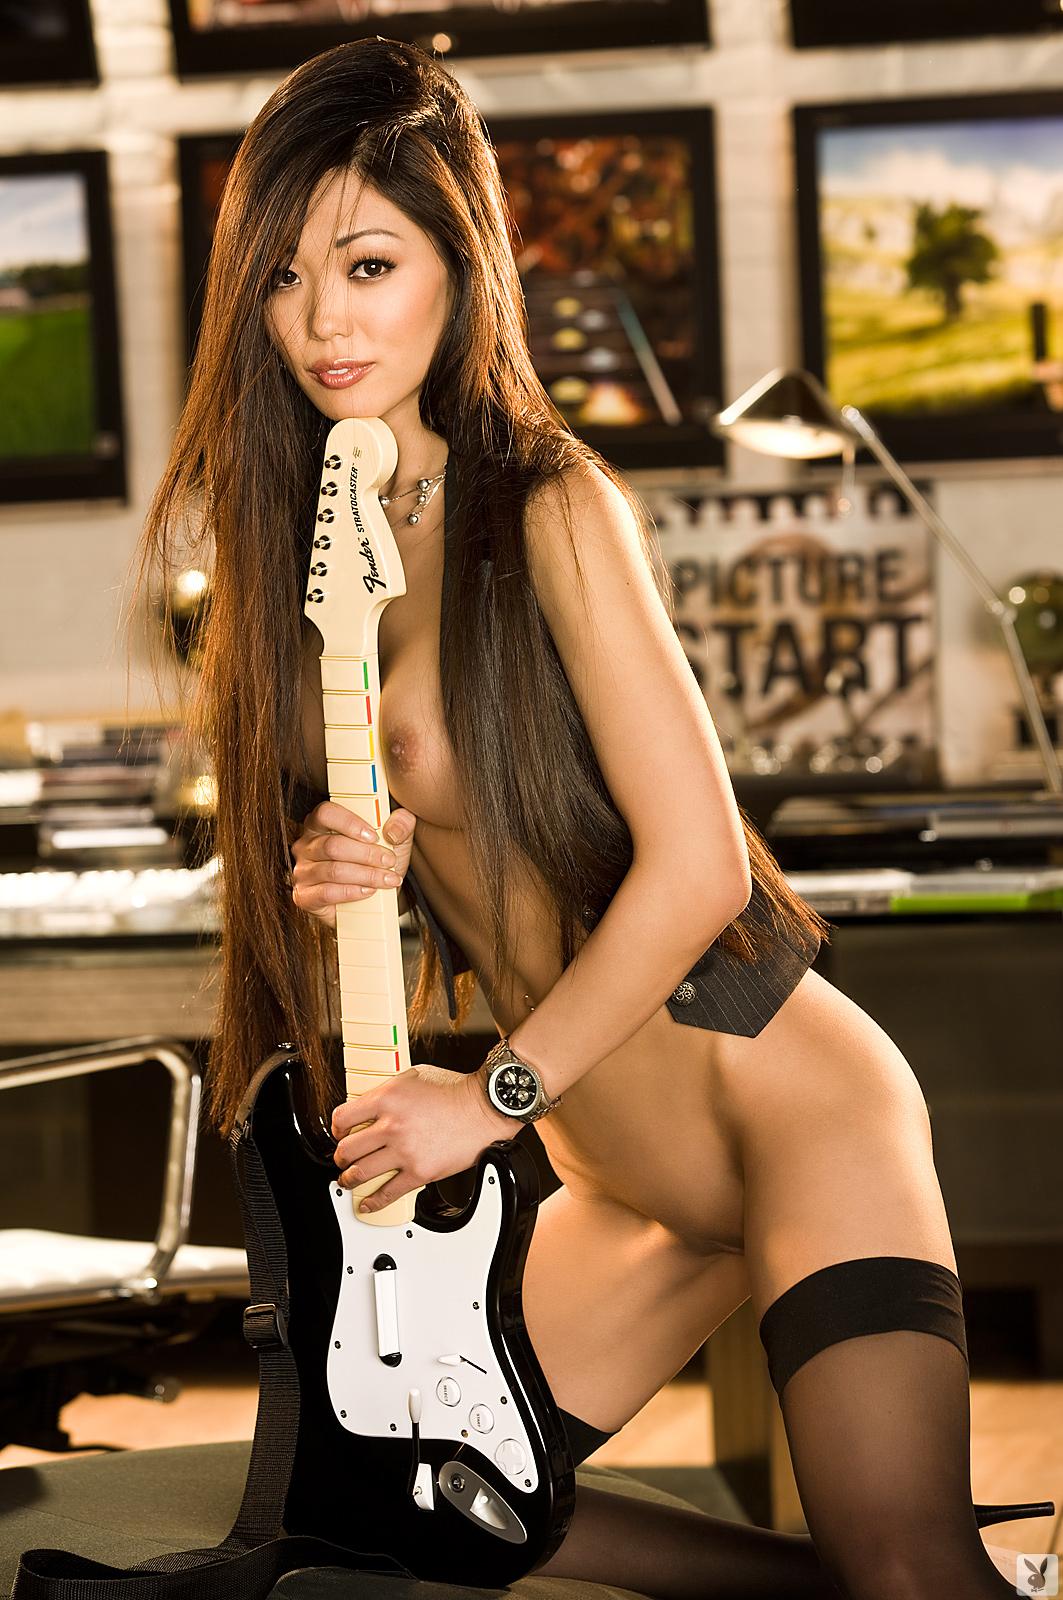 grace-kim-guitar-stockings-naked-asian-playboy-25